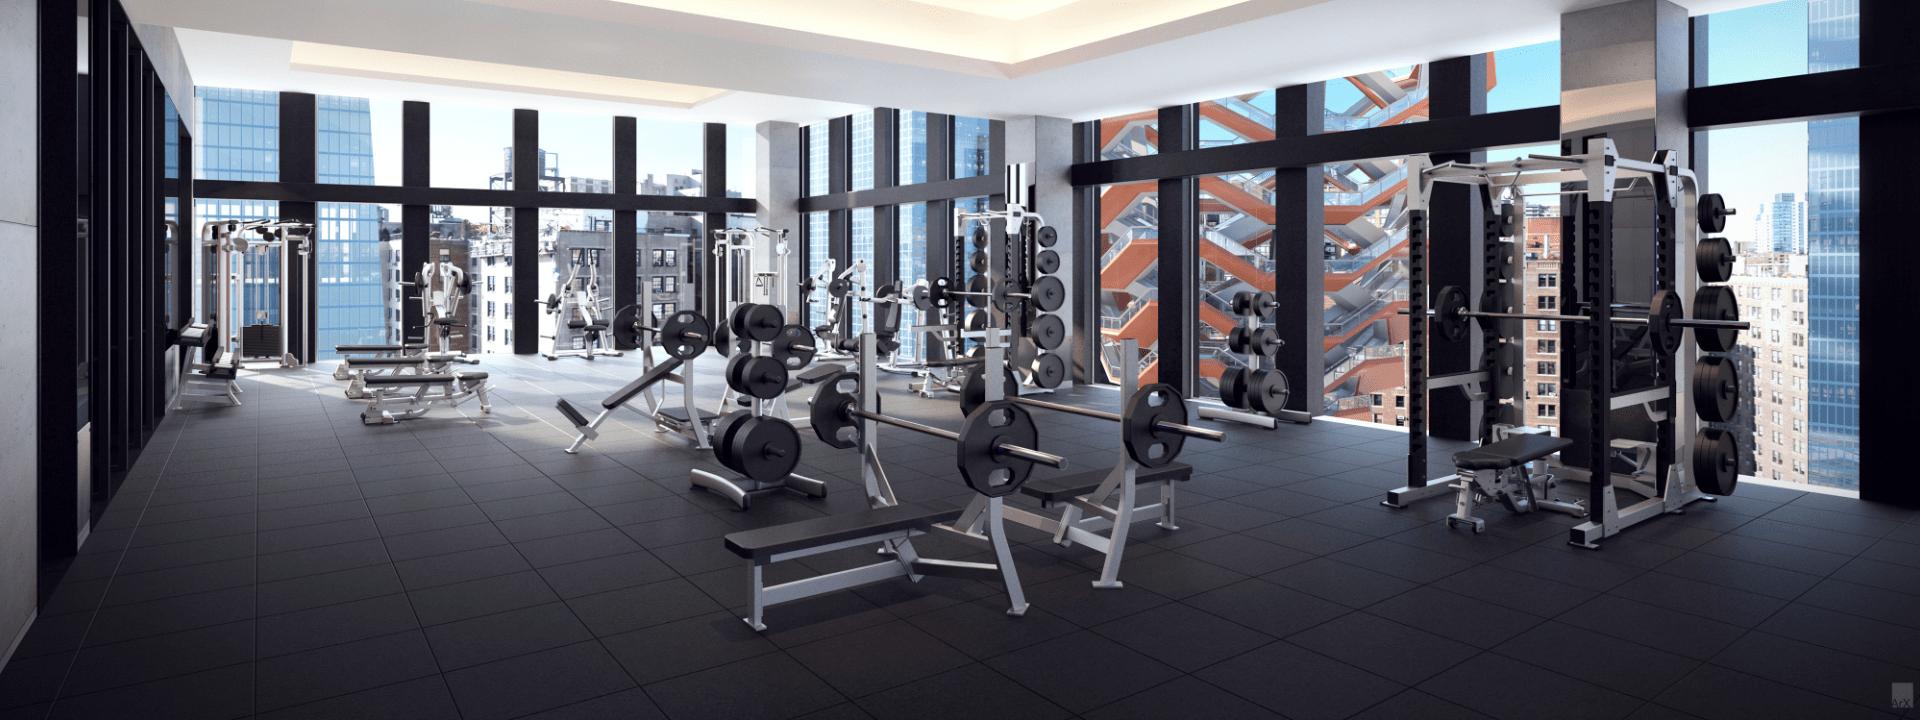 Midtown West Fitness Club Hudson Yards Fitness Club Equinox Fitness Indoor Outdoor Pool